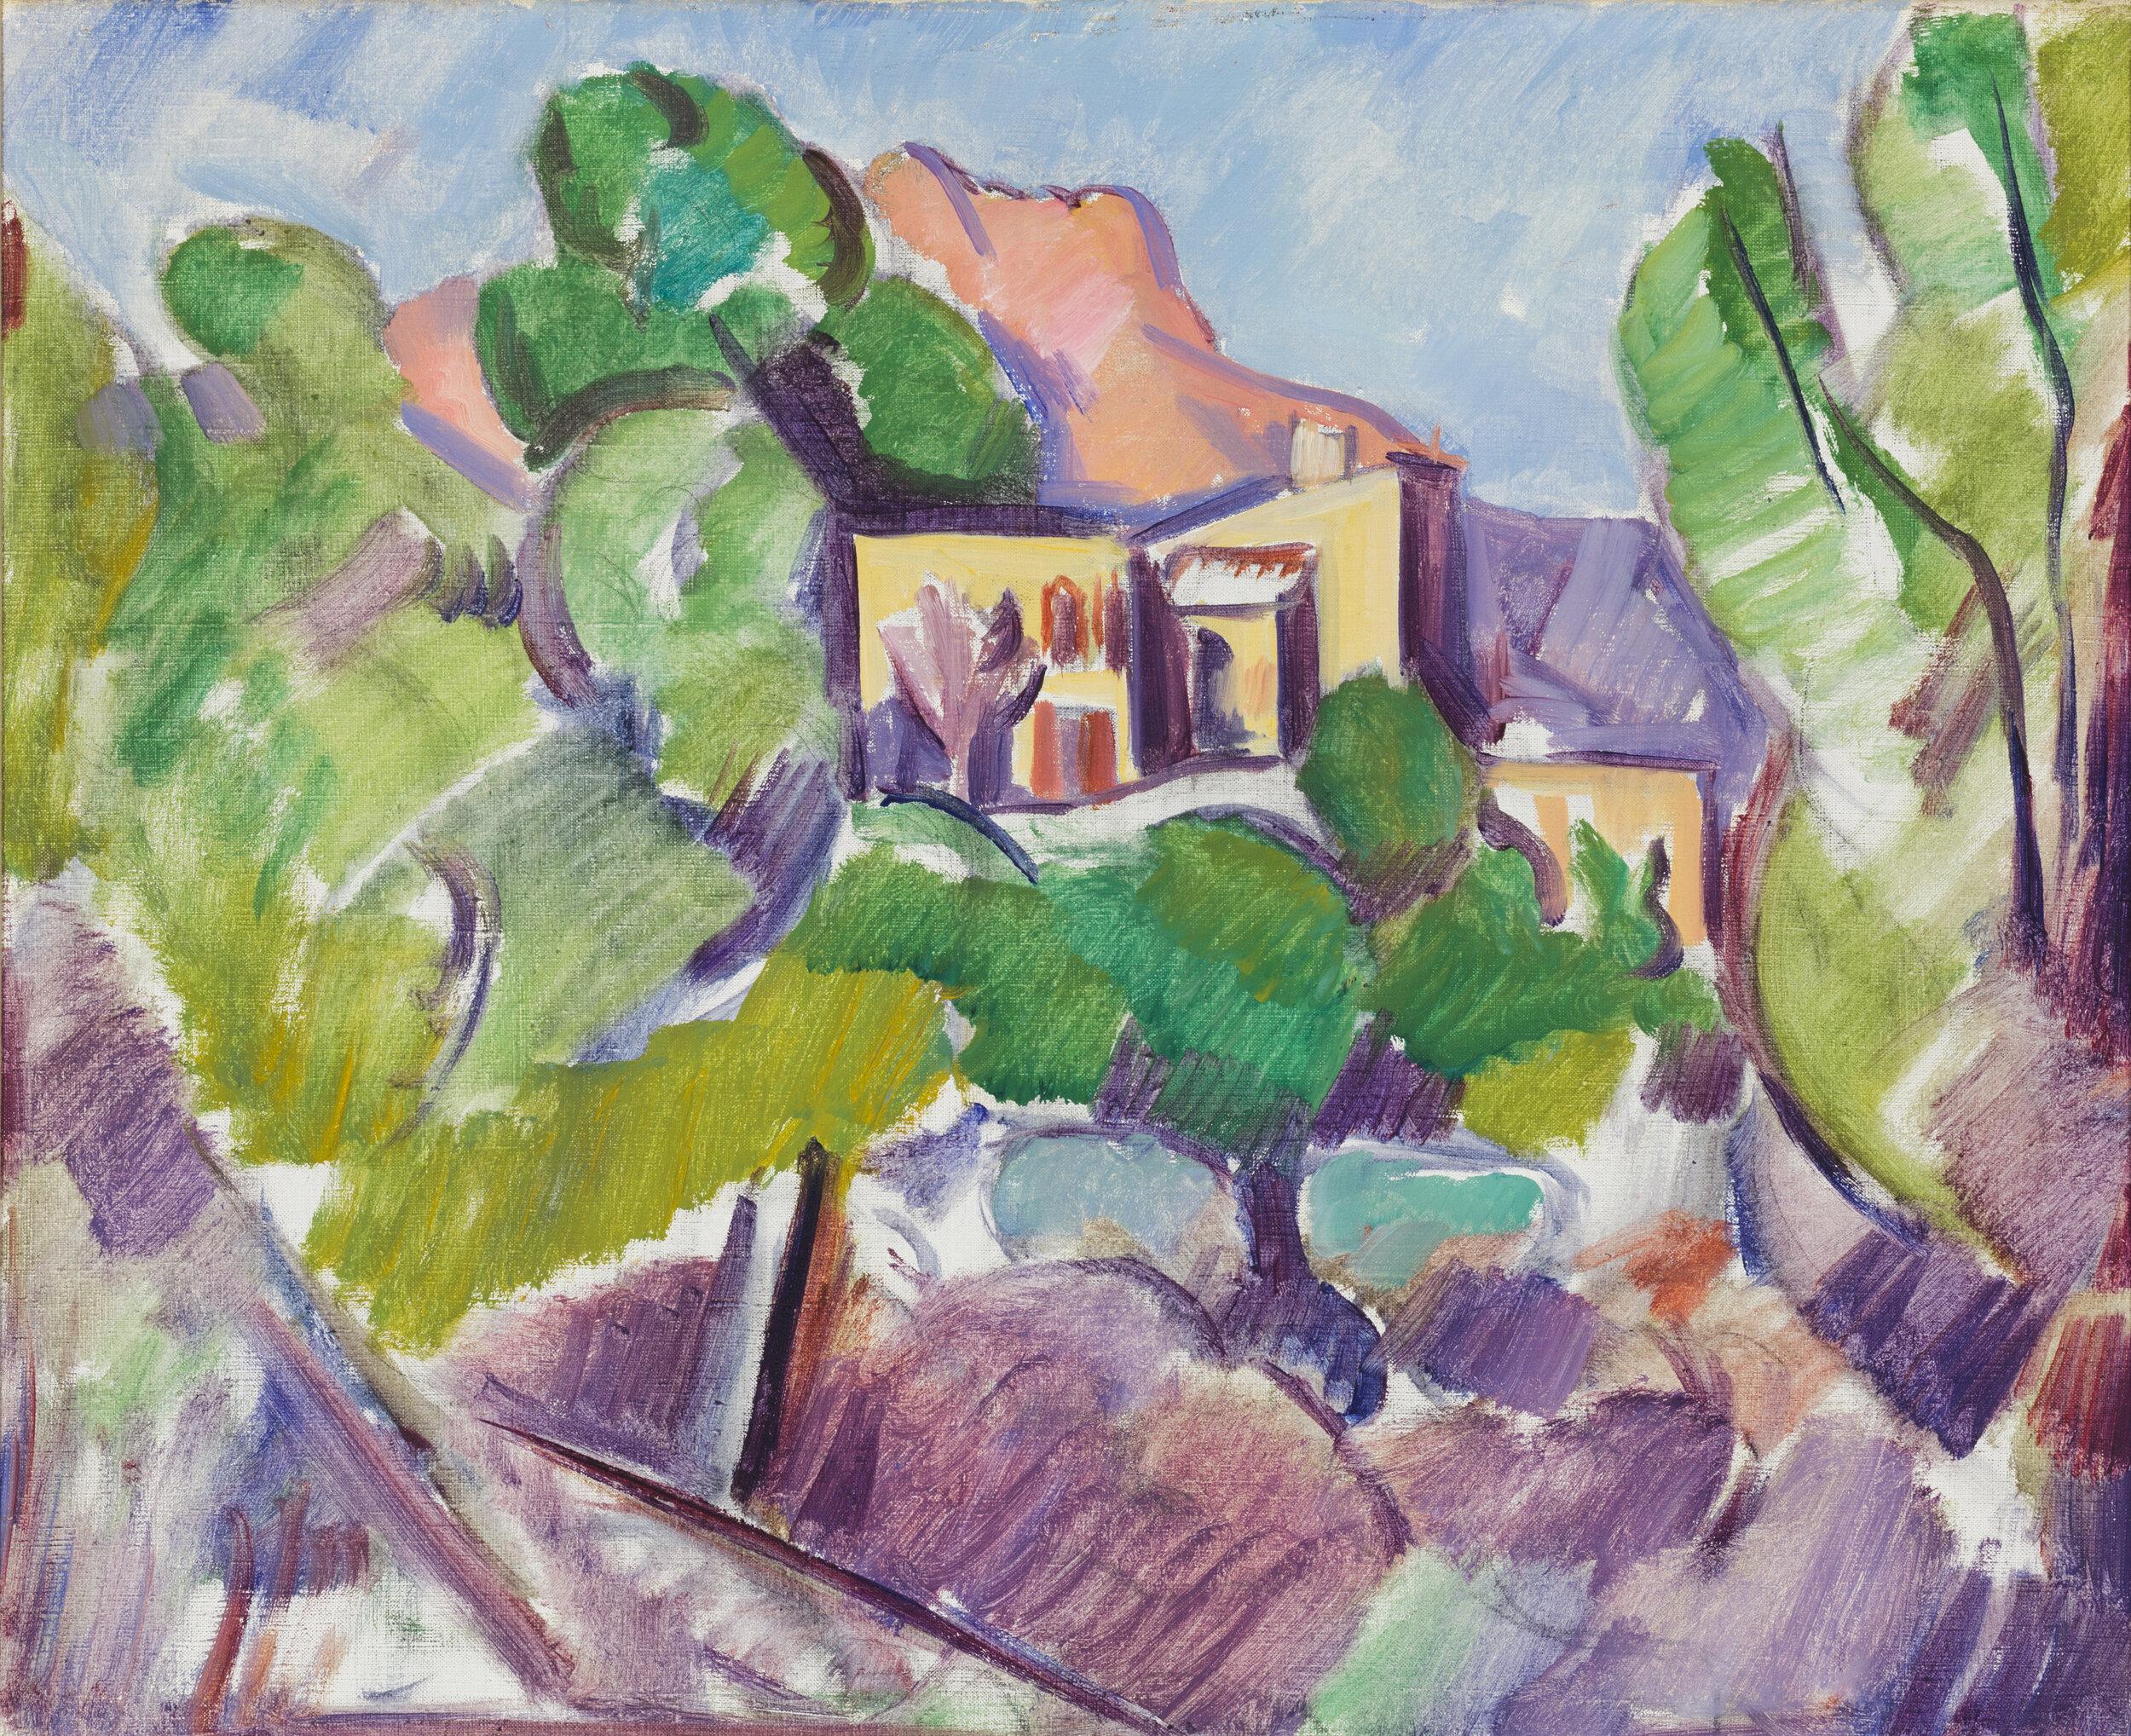 Marsden Hartley  (1877-1943)   Landscape #29, Venice , c. 1926-1927  Oil on canvas, 20 x 24 inches